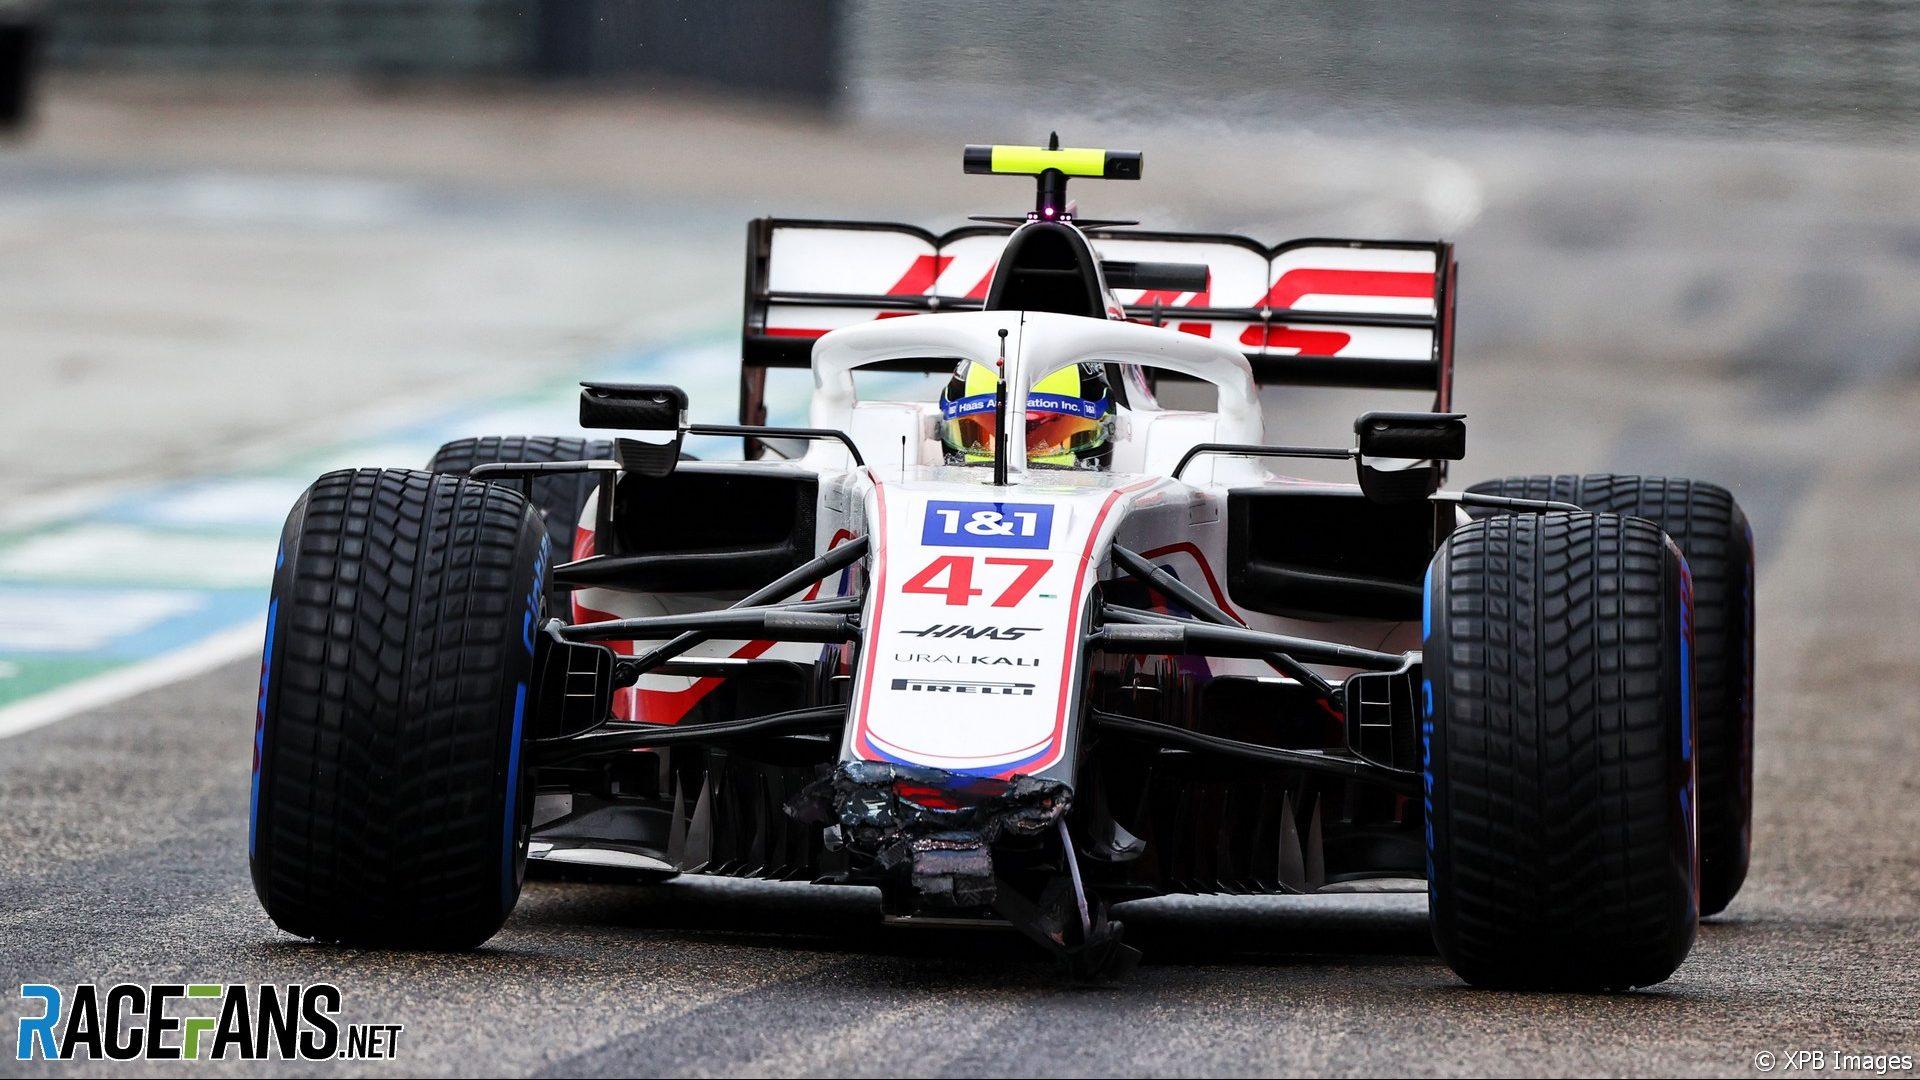 Mick Schumacher, Haas, Imola, 2021